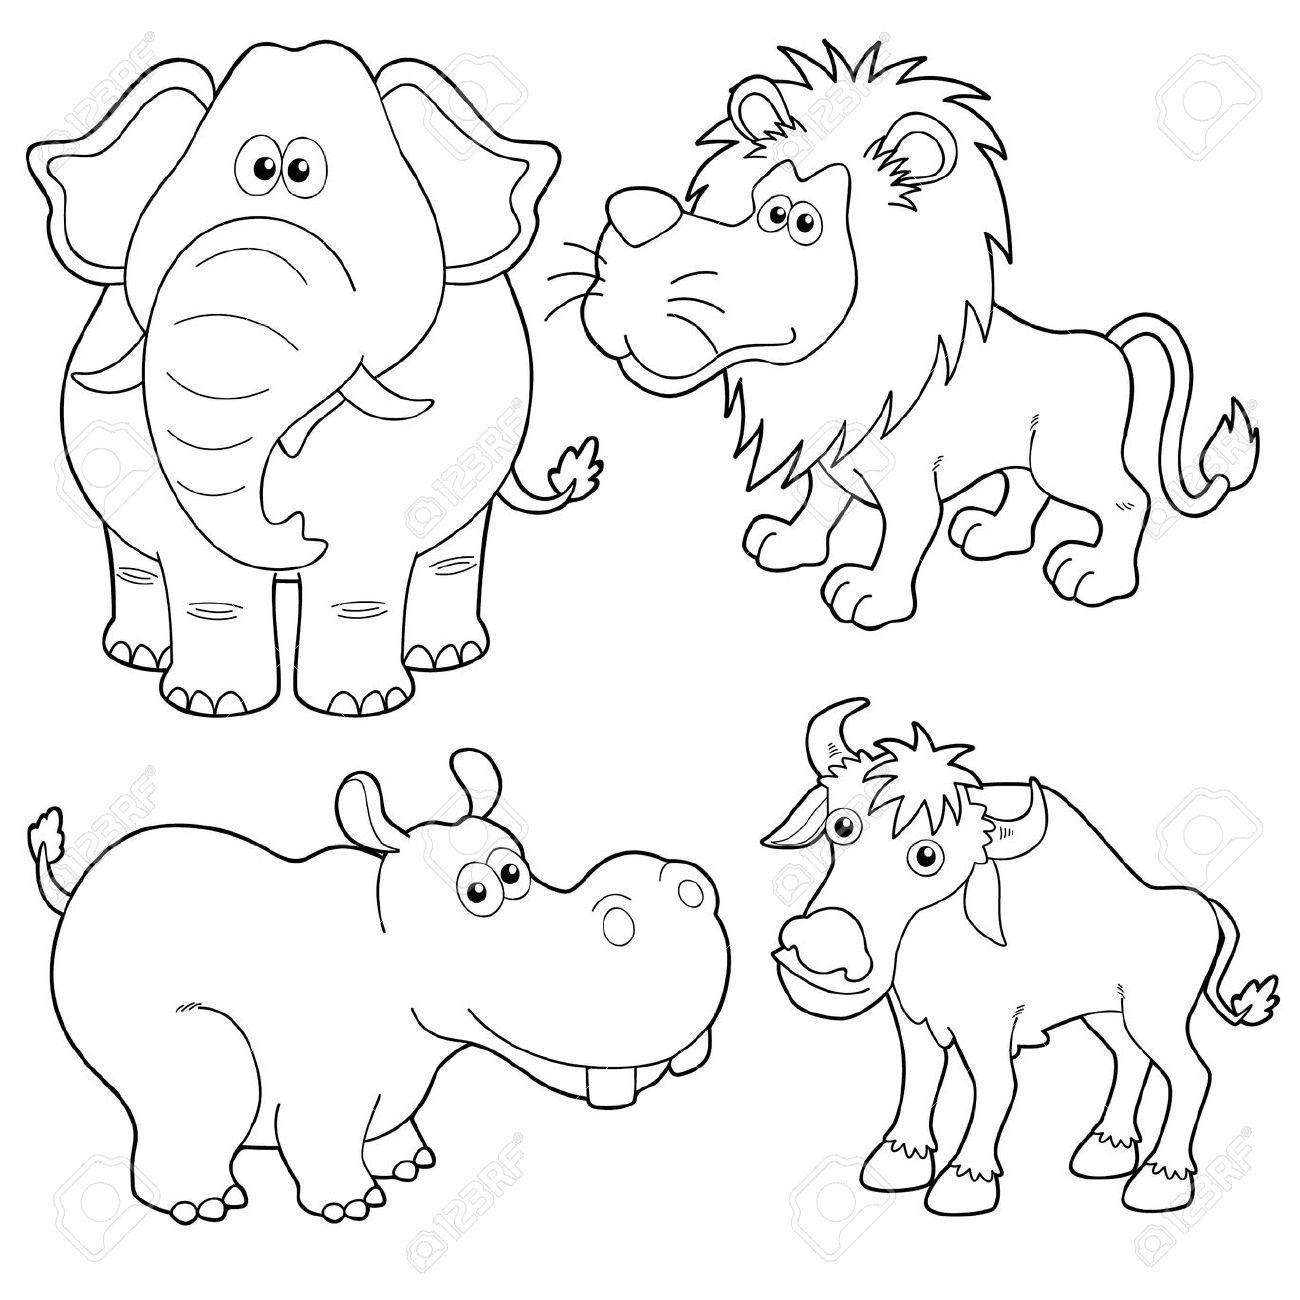 Pin By Kimberly On Educational Pinterest Animal Stencil Cartoon